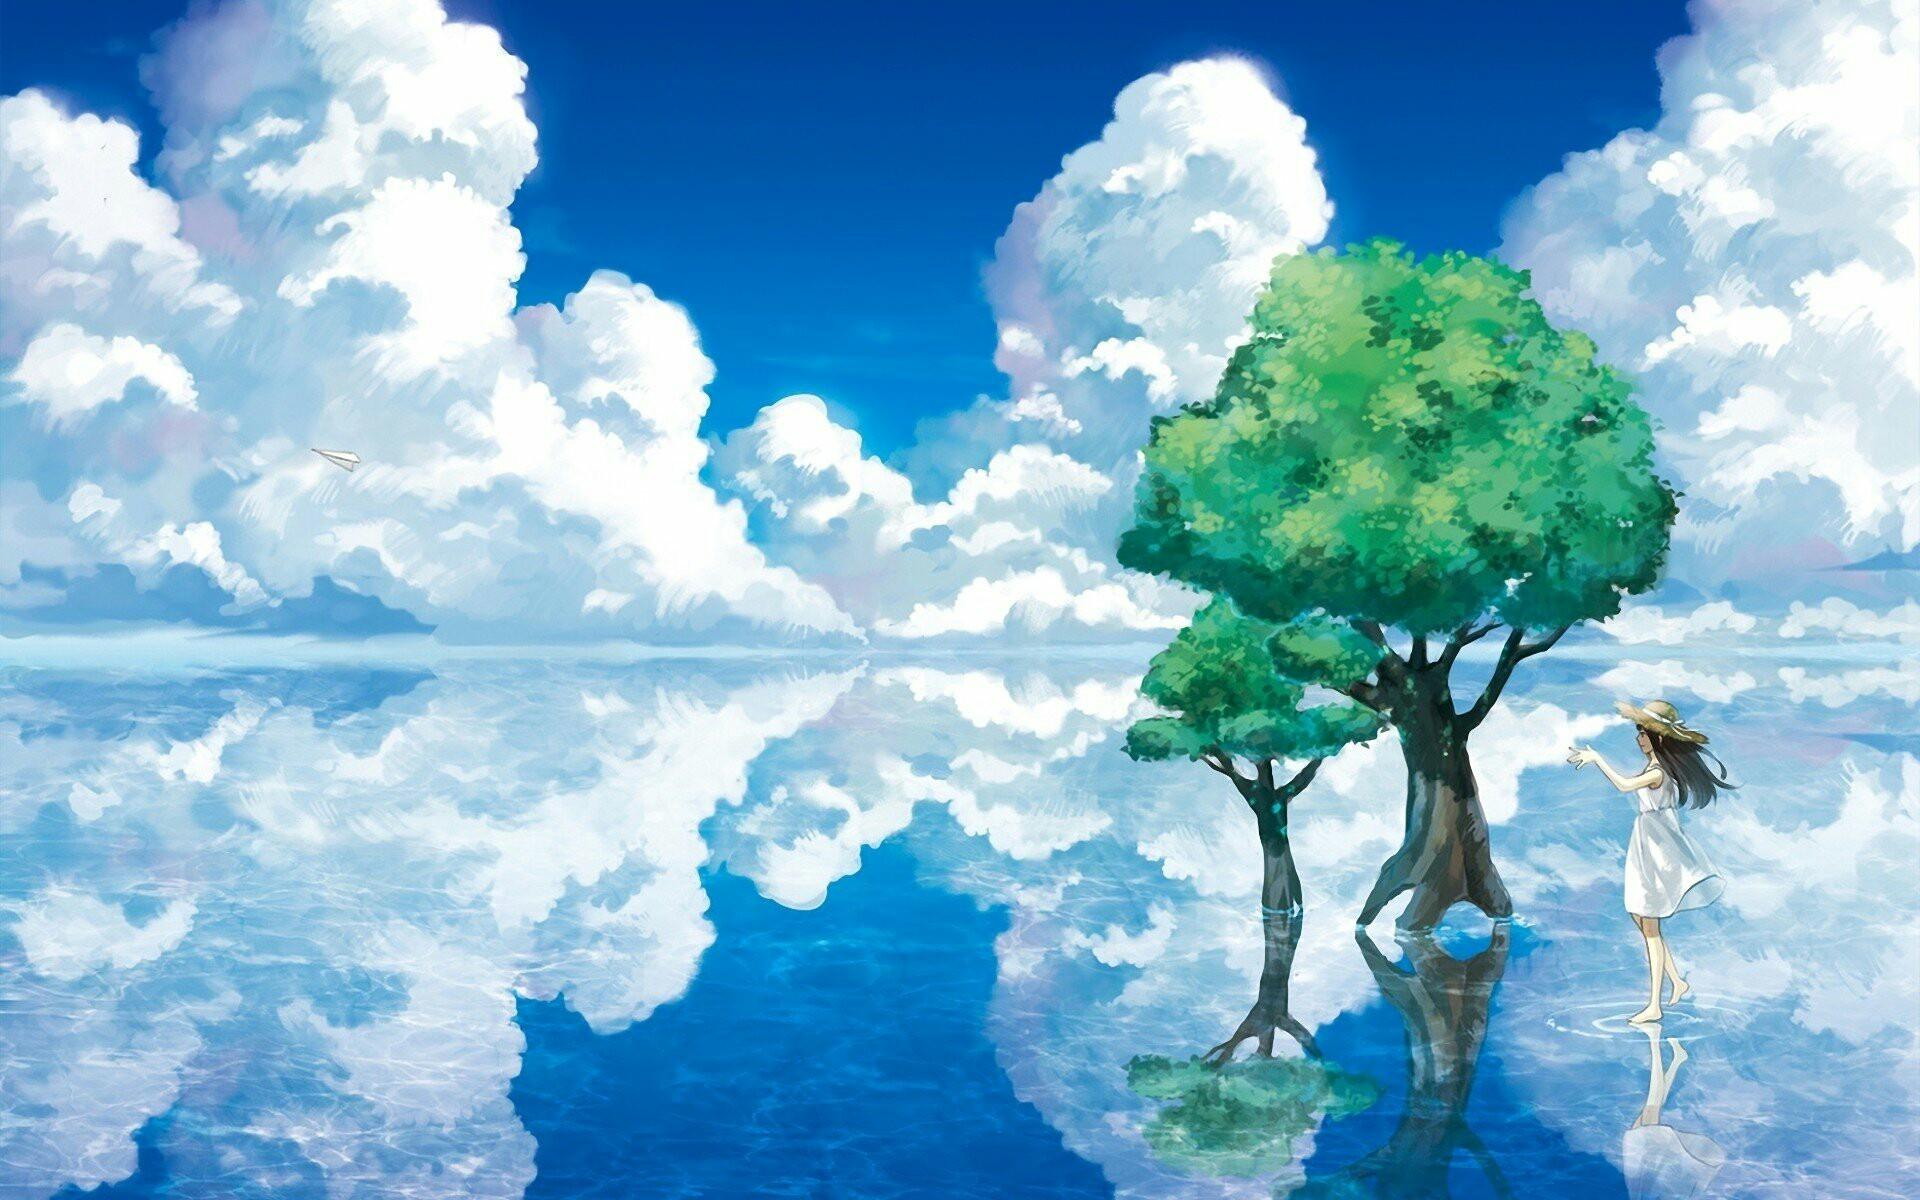 #animewallpaper #wallpaper #kawaii #sky #ezmkurd #خلفيات_انمي #انمي_غلاف  anime sky